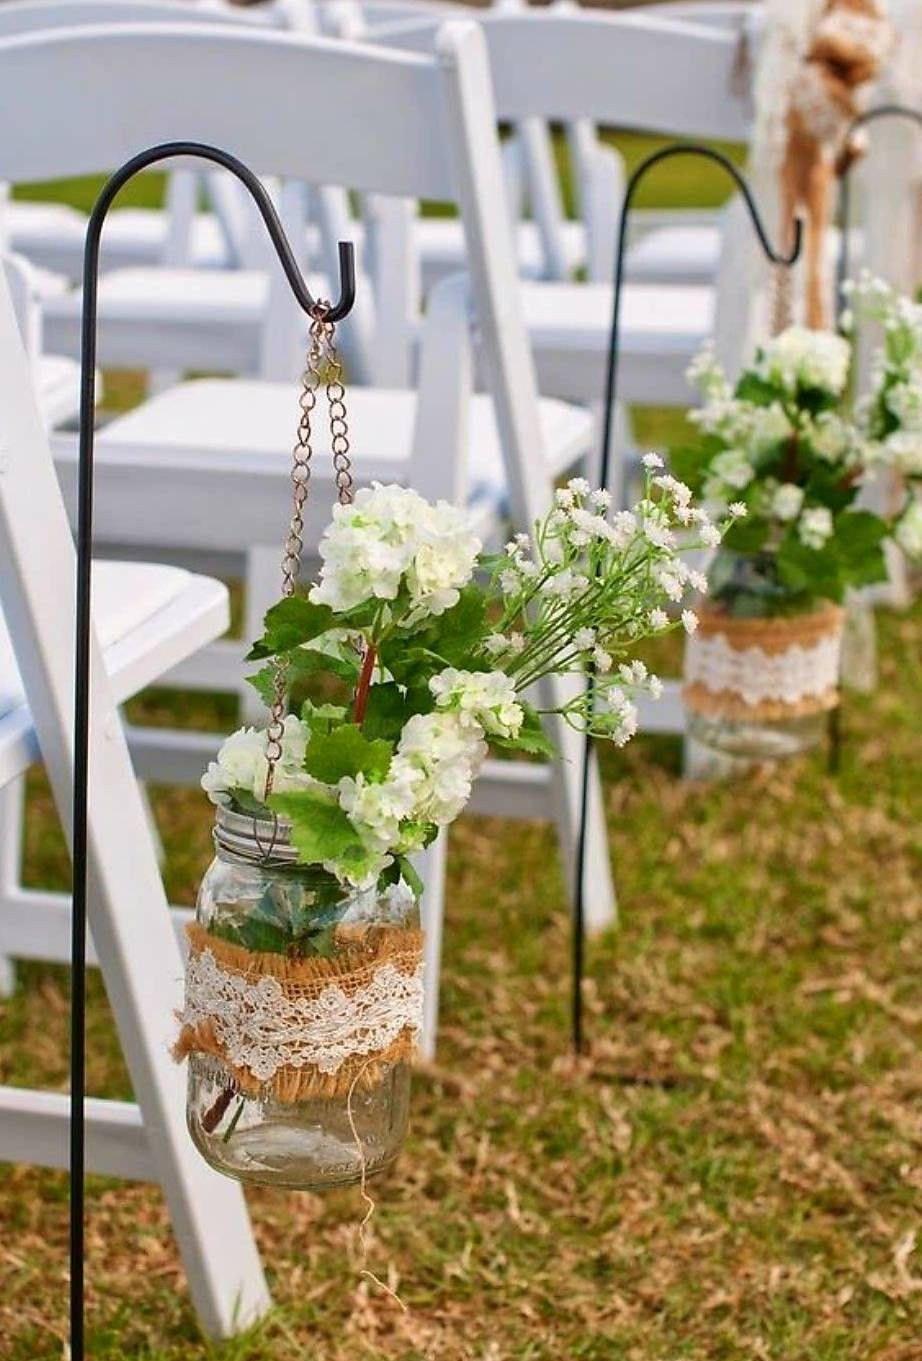 36 The Most Romantic Burlap Wedding Decoration Ideas Amaze Paperie Wedding Aisle Outdoor Wedding Aisle Decorations Rustic Burlap Wedding